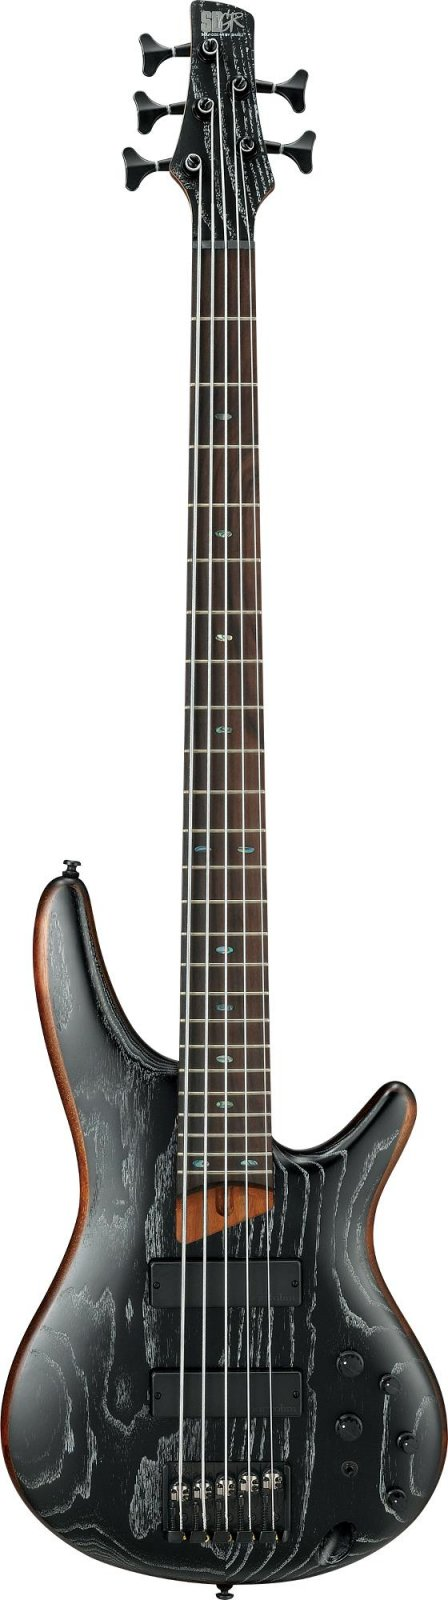 Ibanez SR675SKF Electric 5-String Bass Guitar